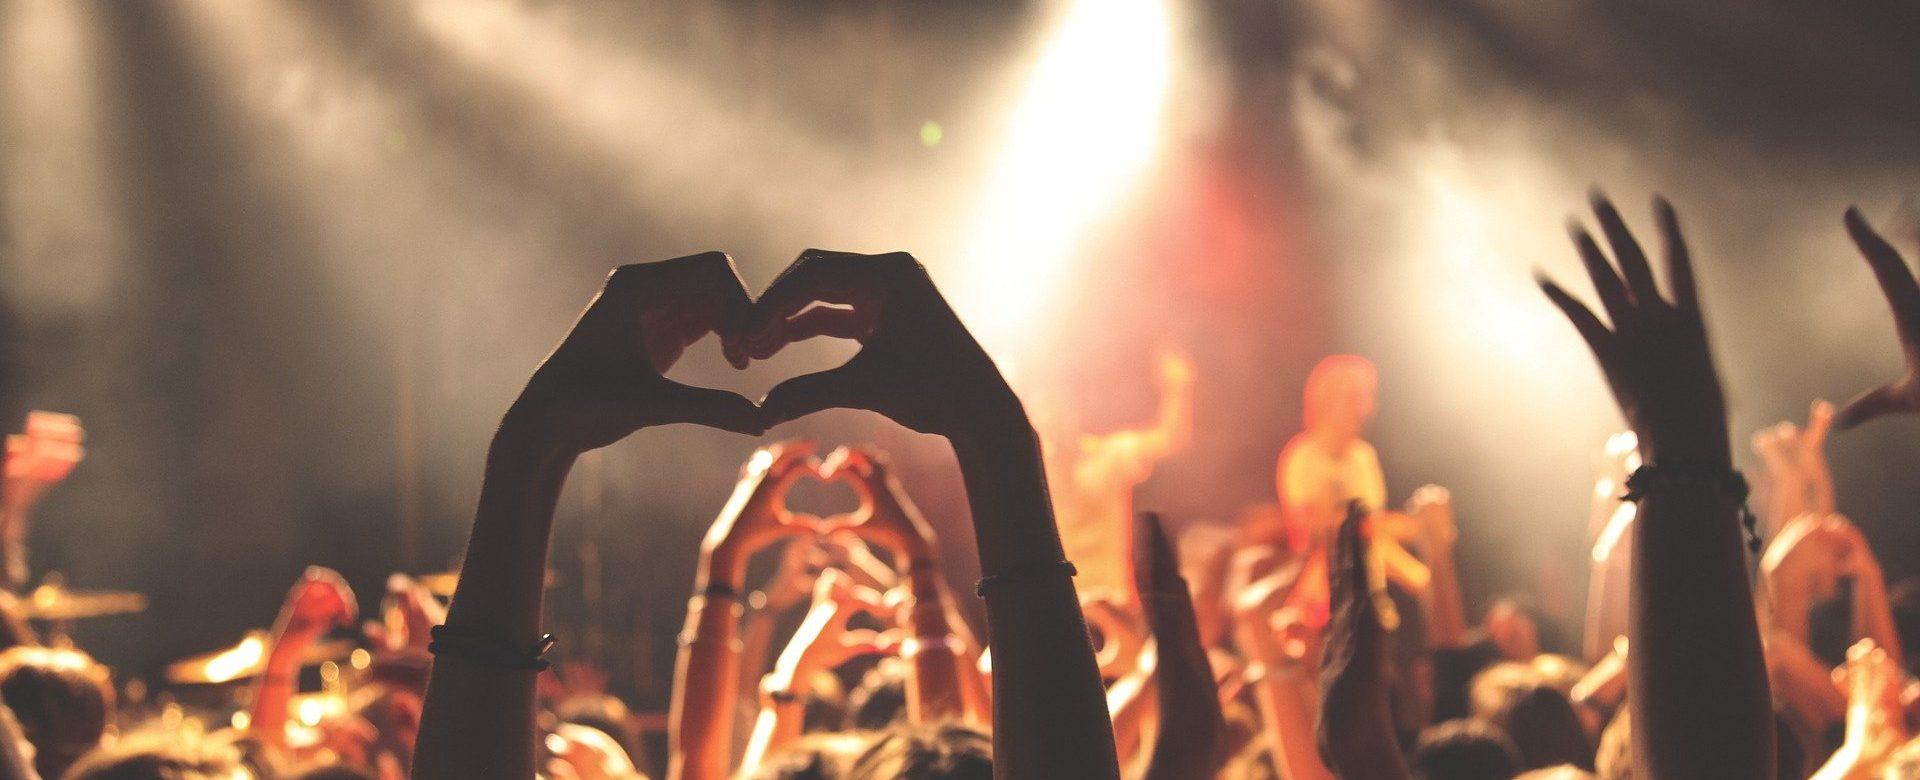 pixabay_Konzertpublikum